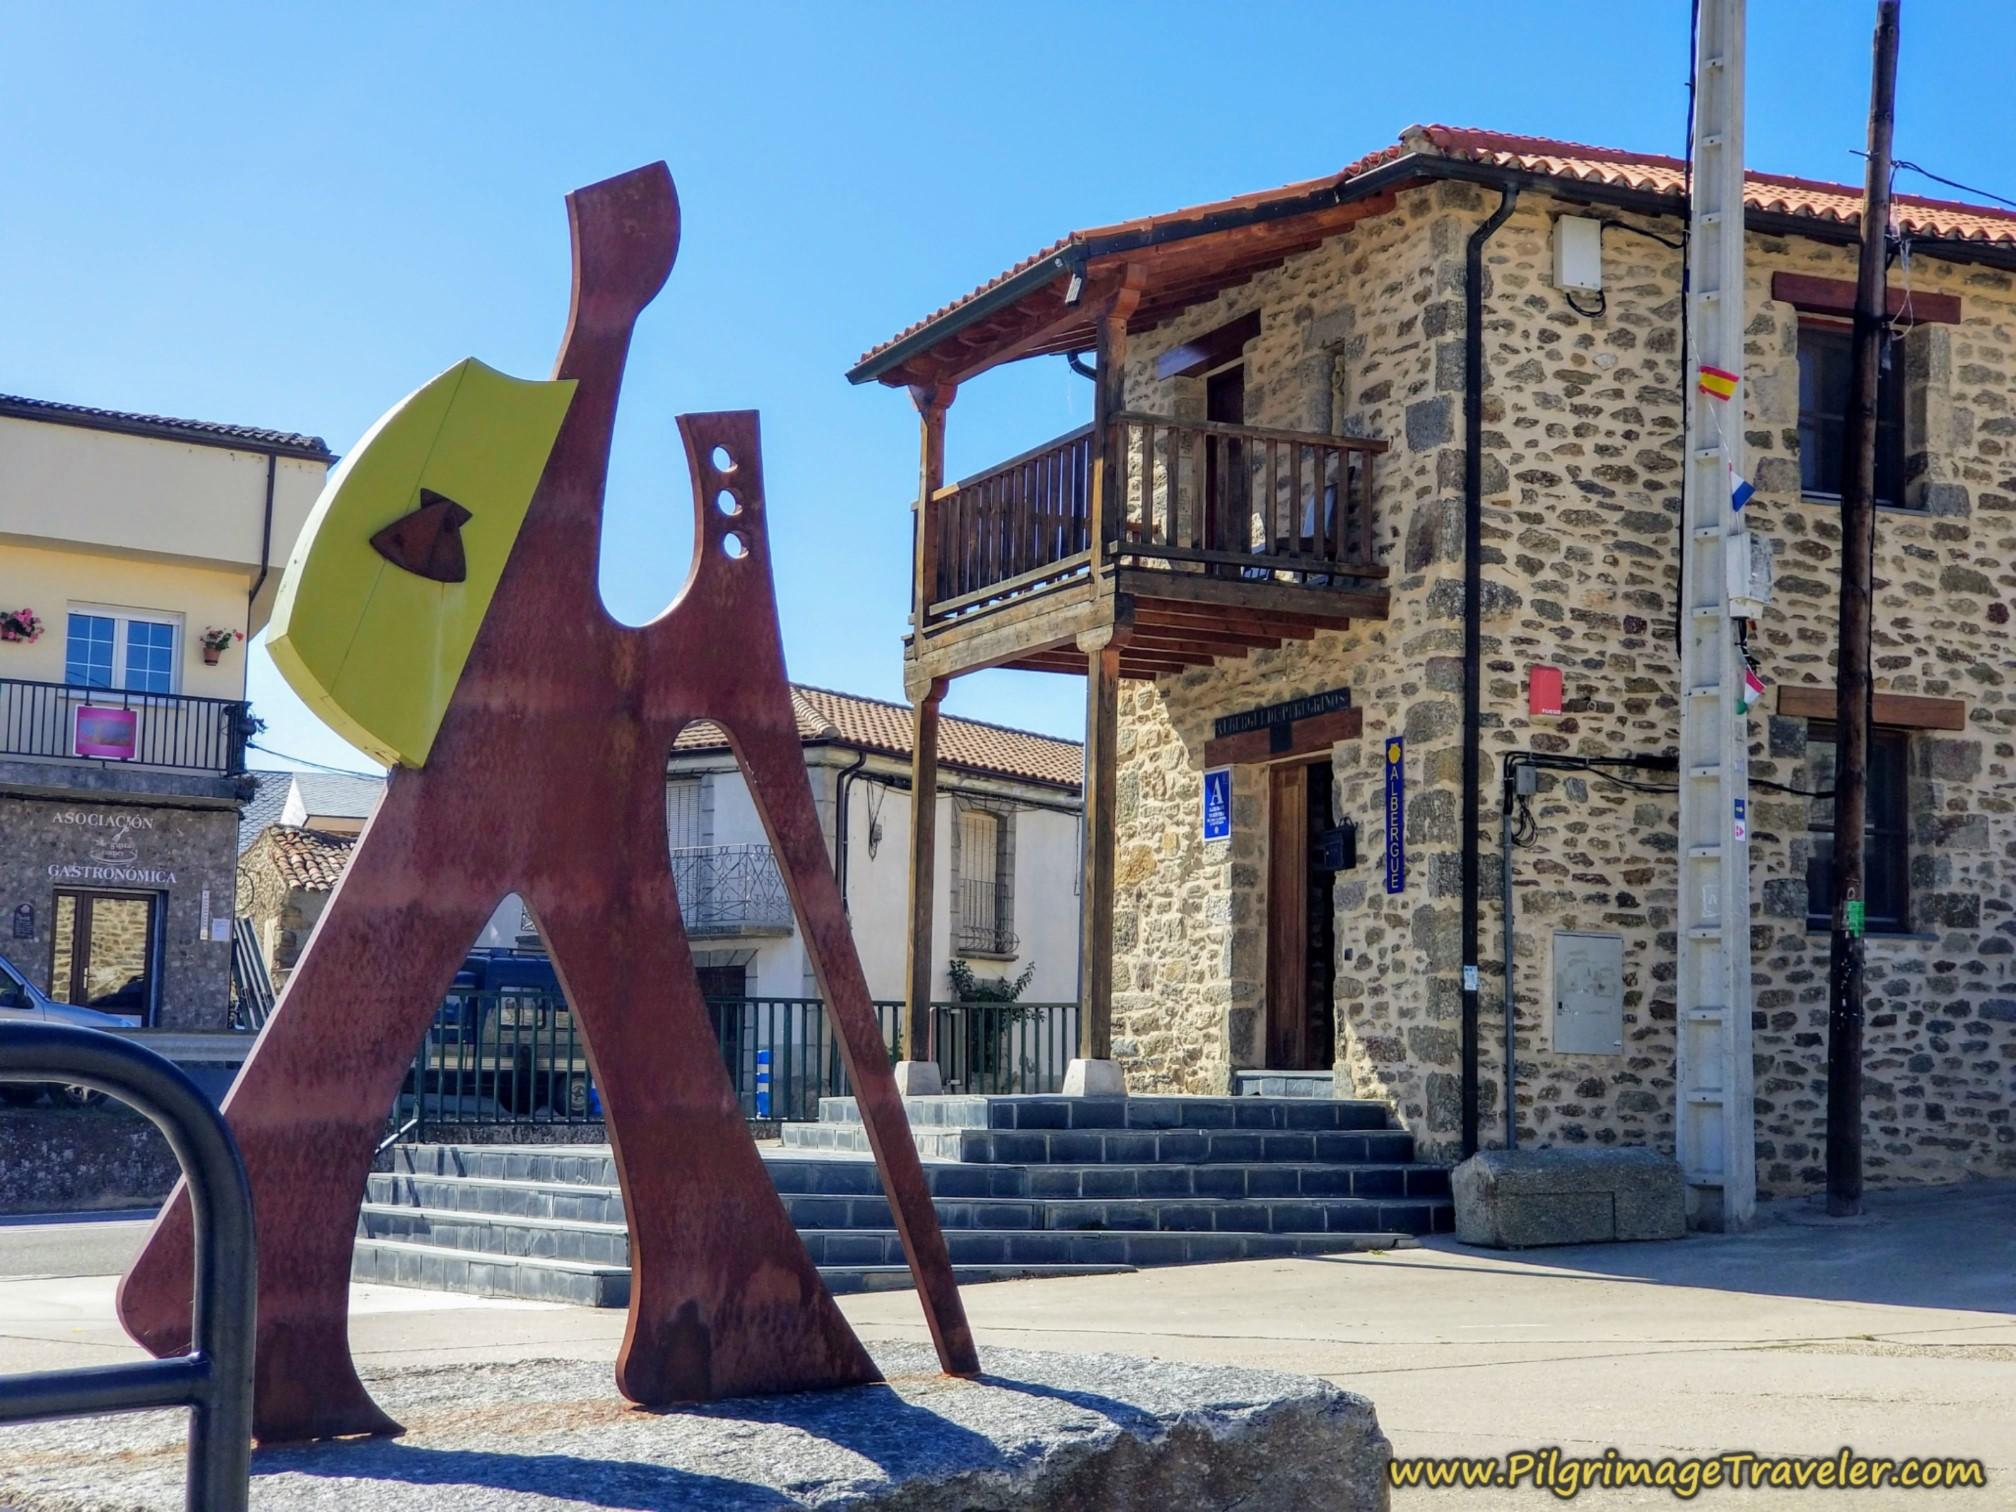 Day Three ~ Santa Marta de Tera to Rionegro del Puente, 27.2 Kilometers (16.9 Miles)